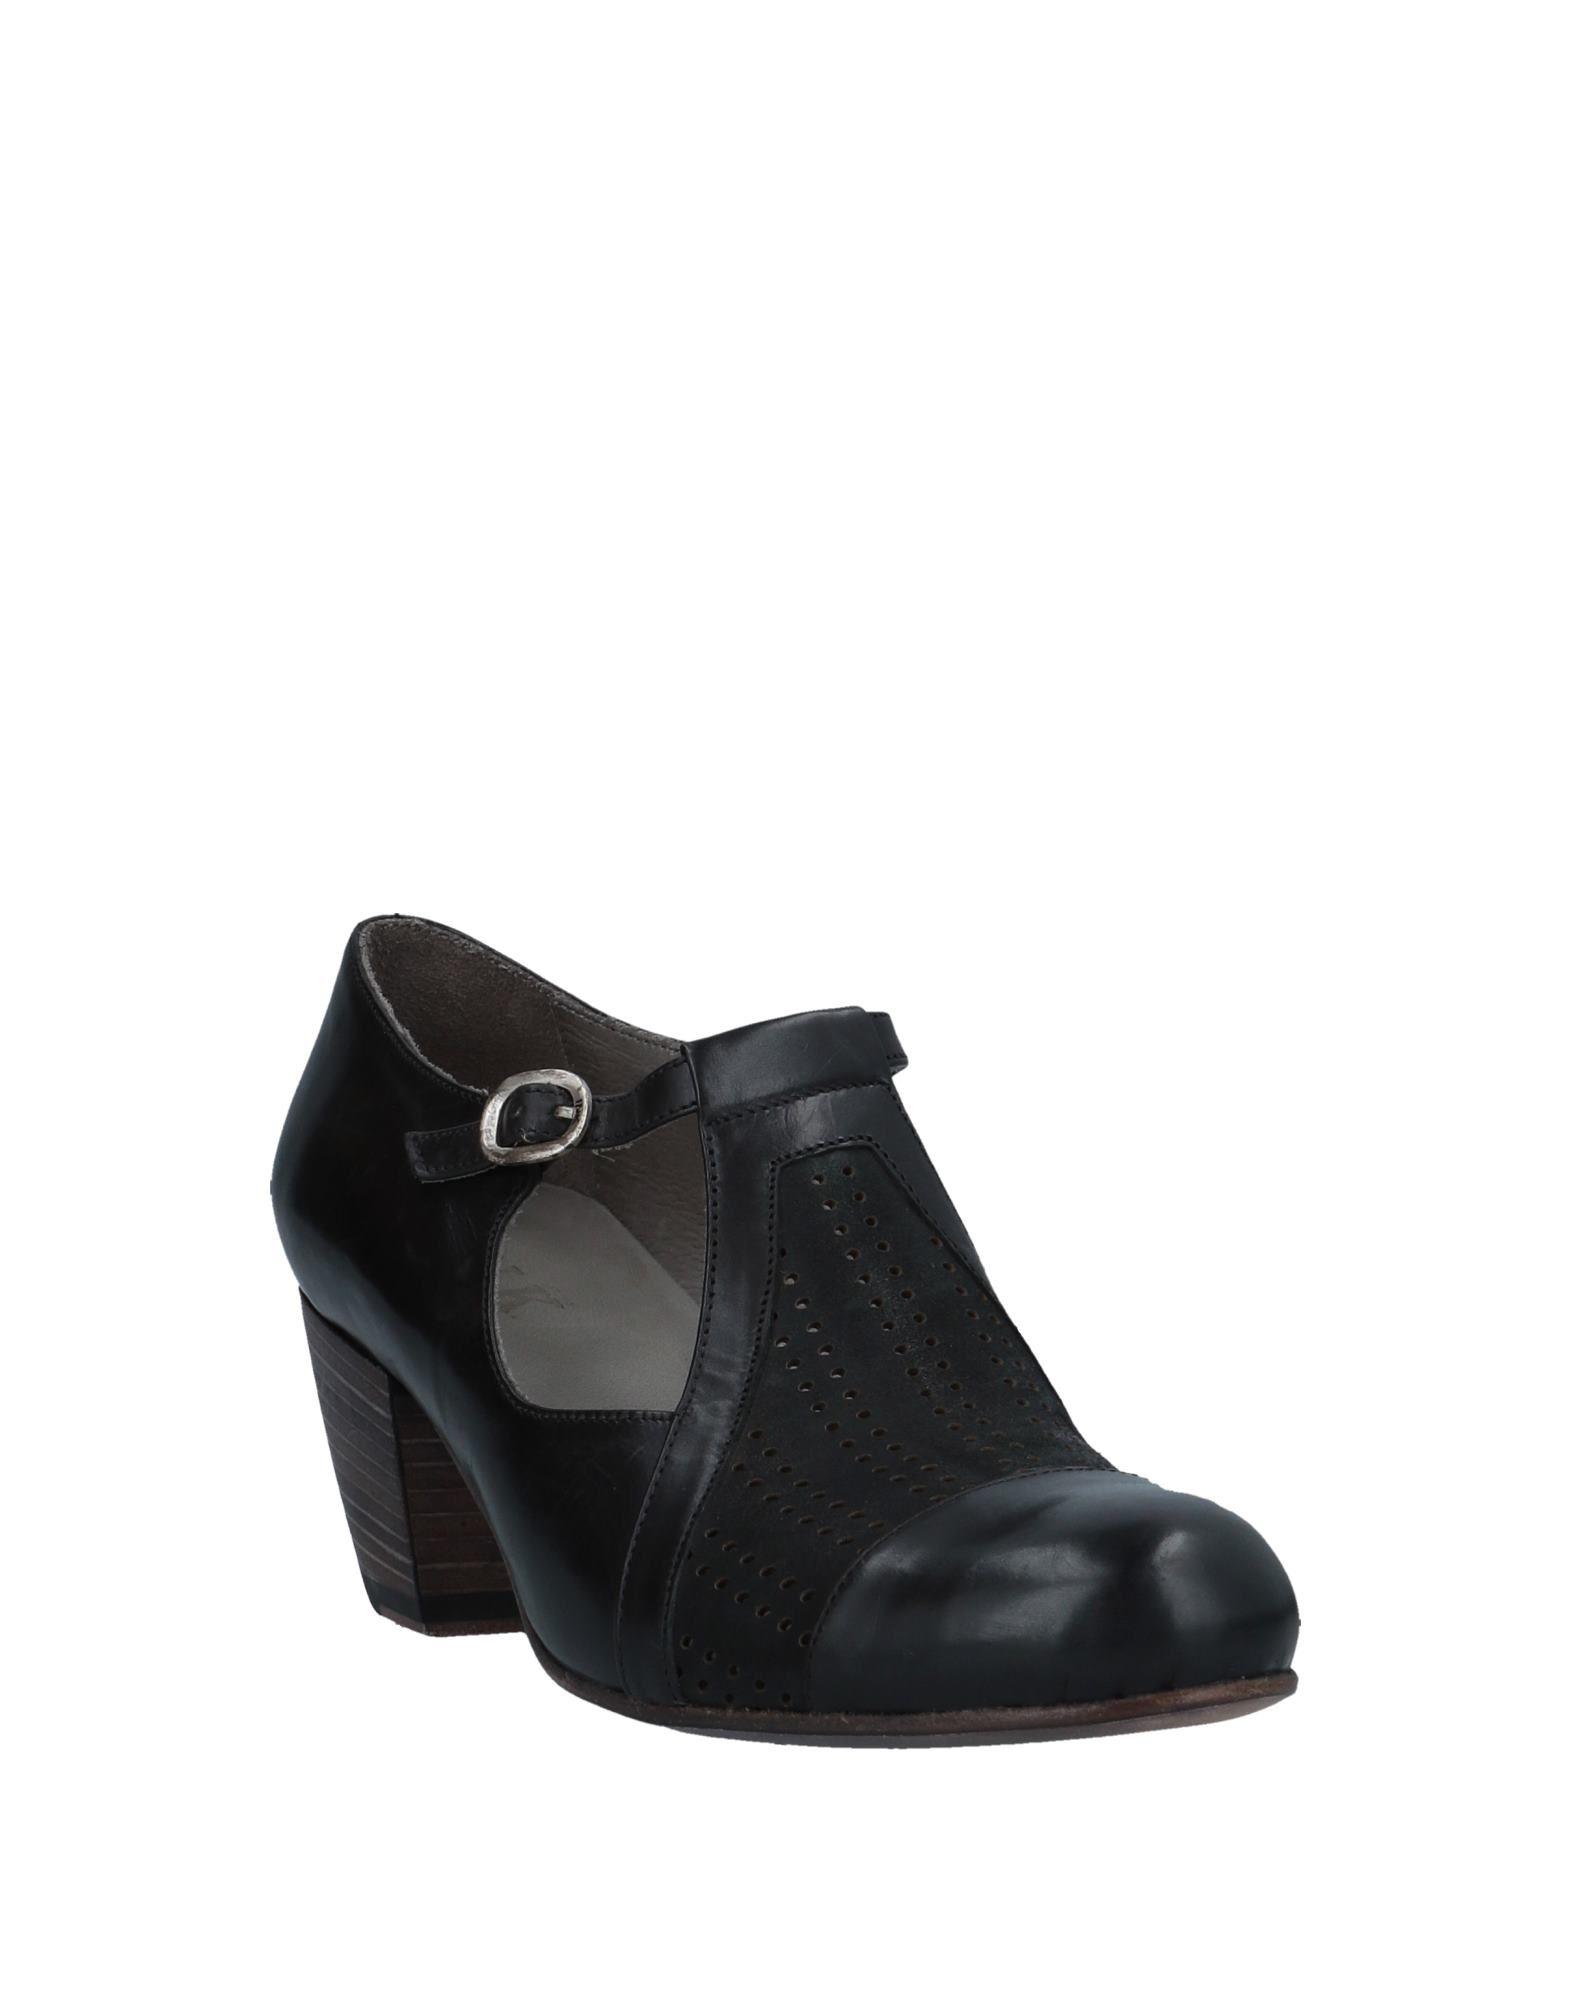 Stilvolle Stiefelette billige Schuhe I.N.K. Schuhes Stiefelette Stilvolle Damen  11548560OW 994493